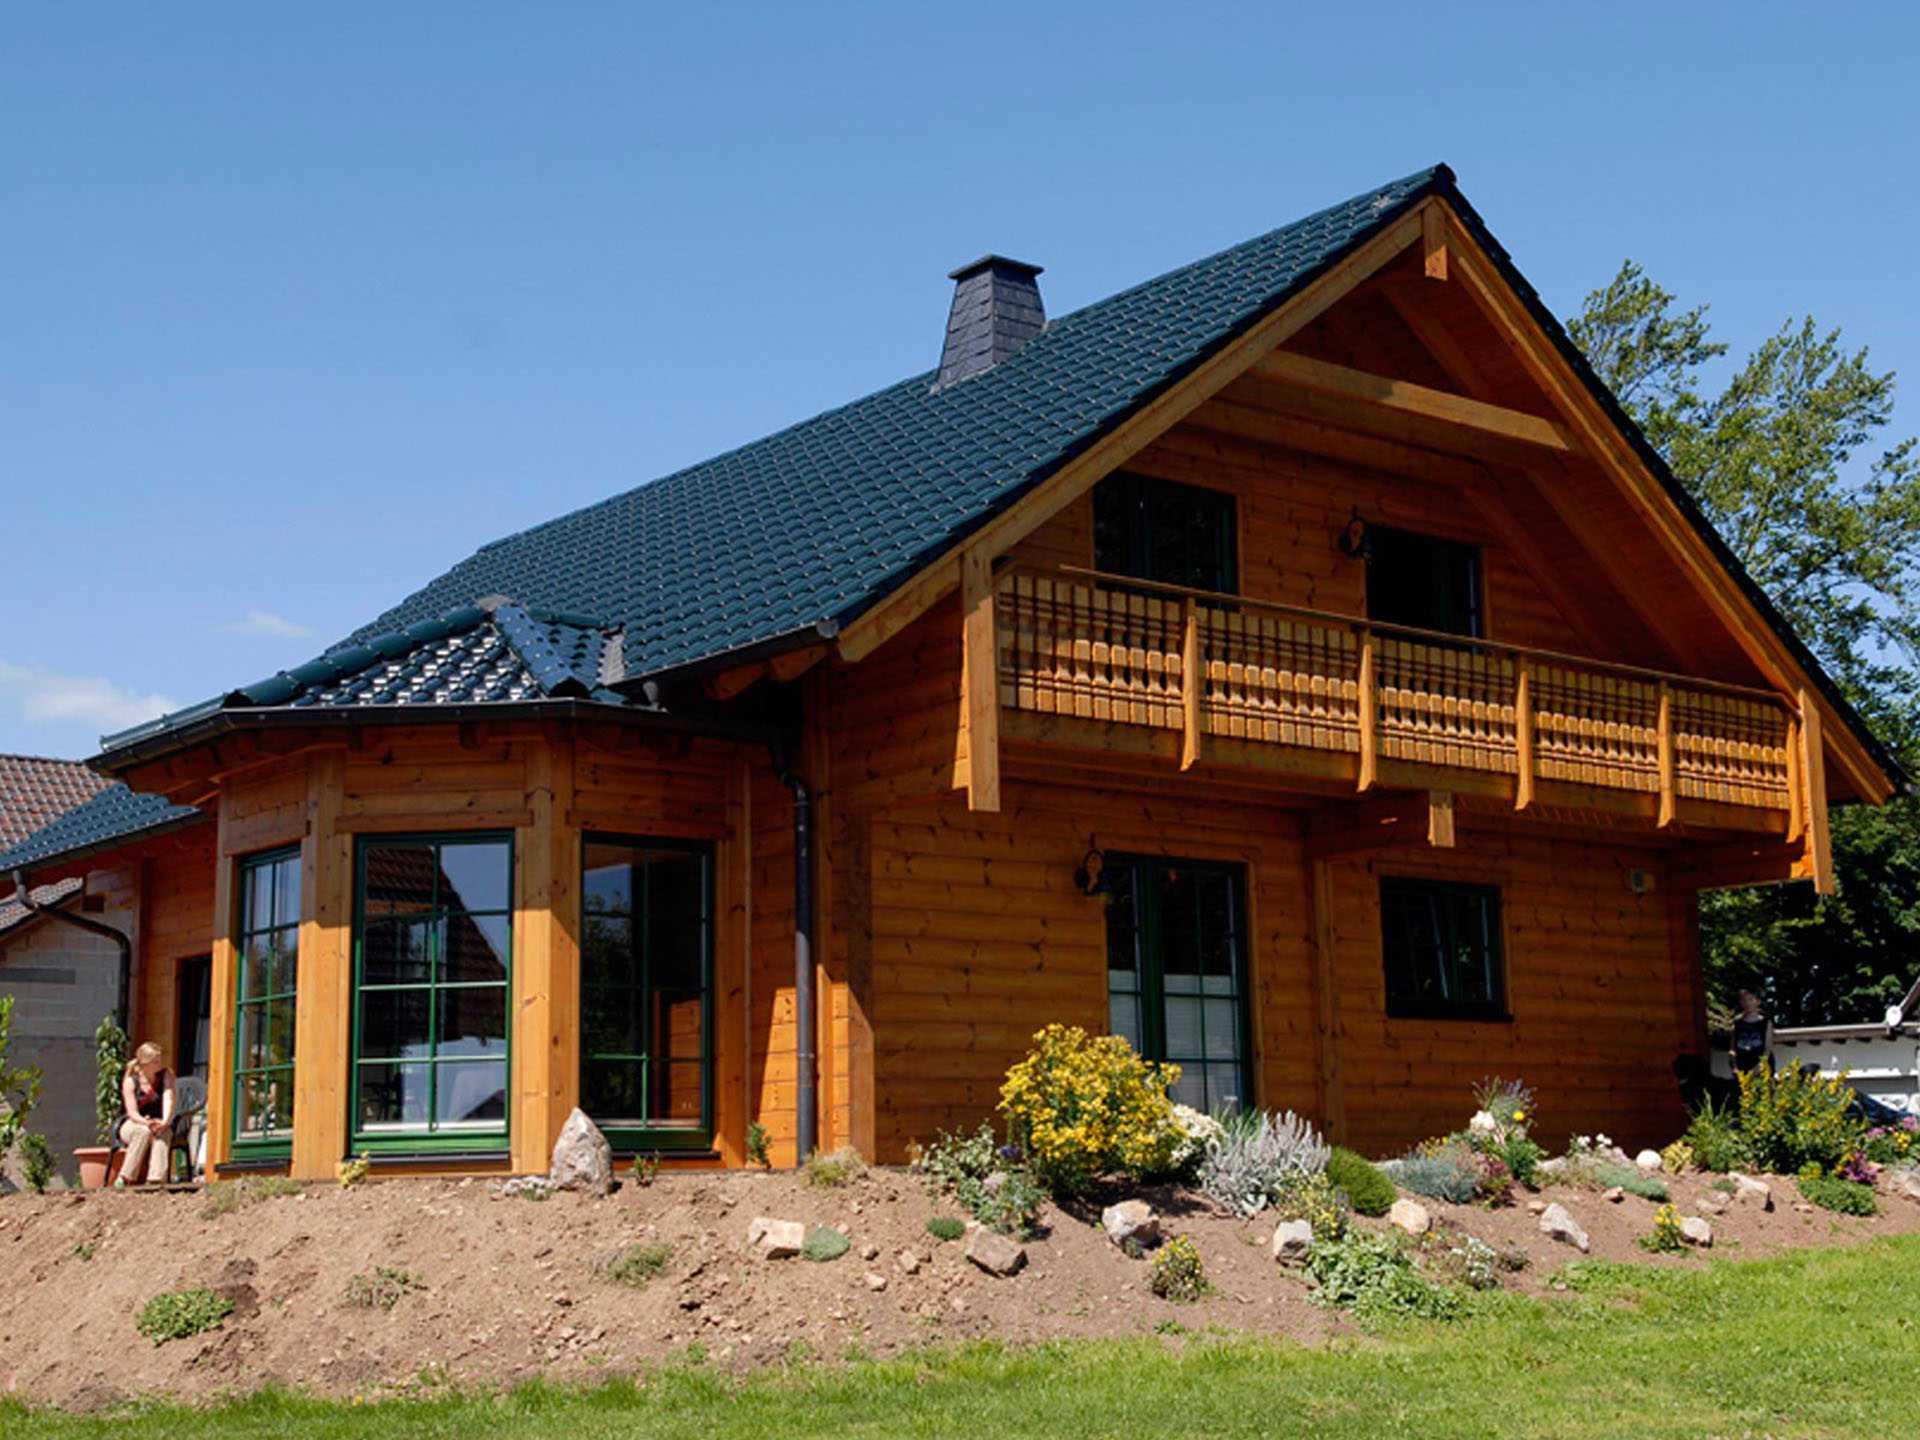 Holzhaus Almof Fullwood Wohnblockhaus